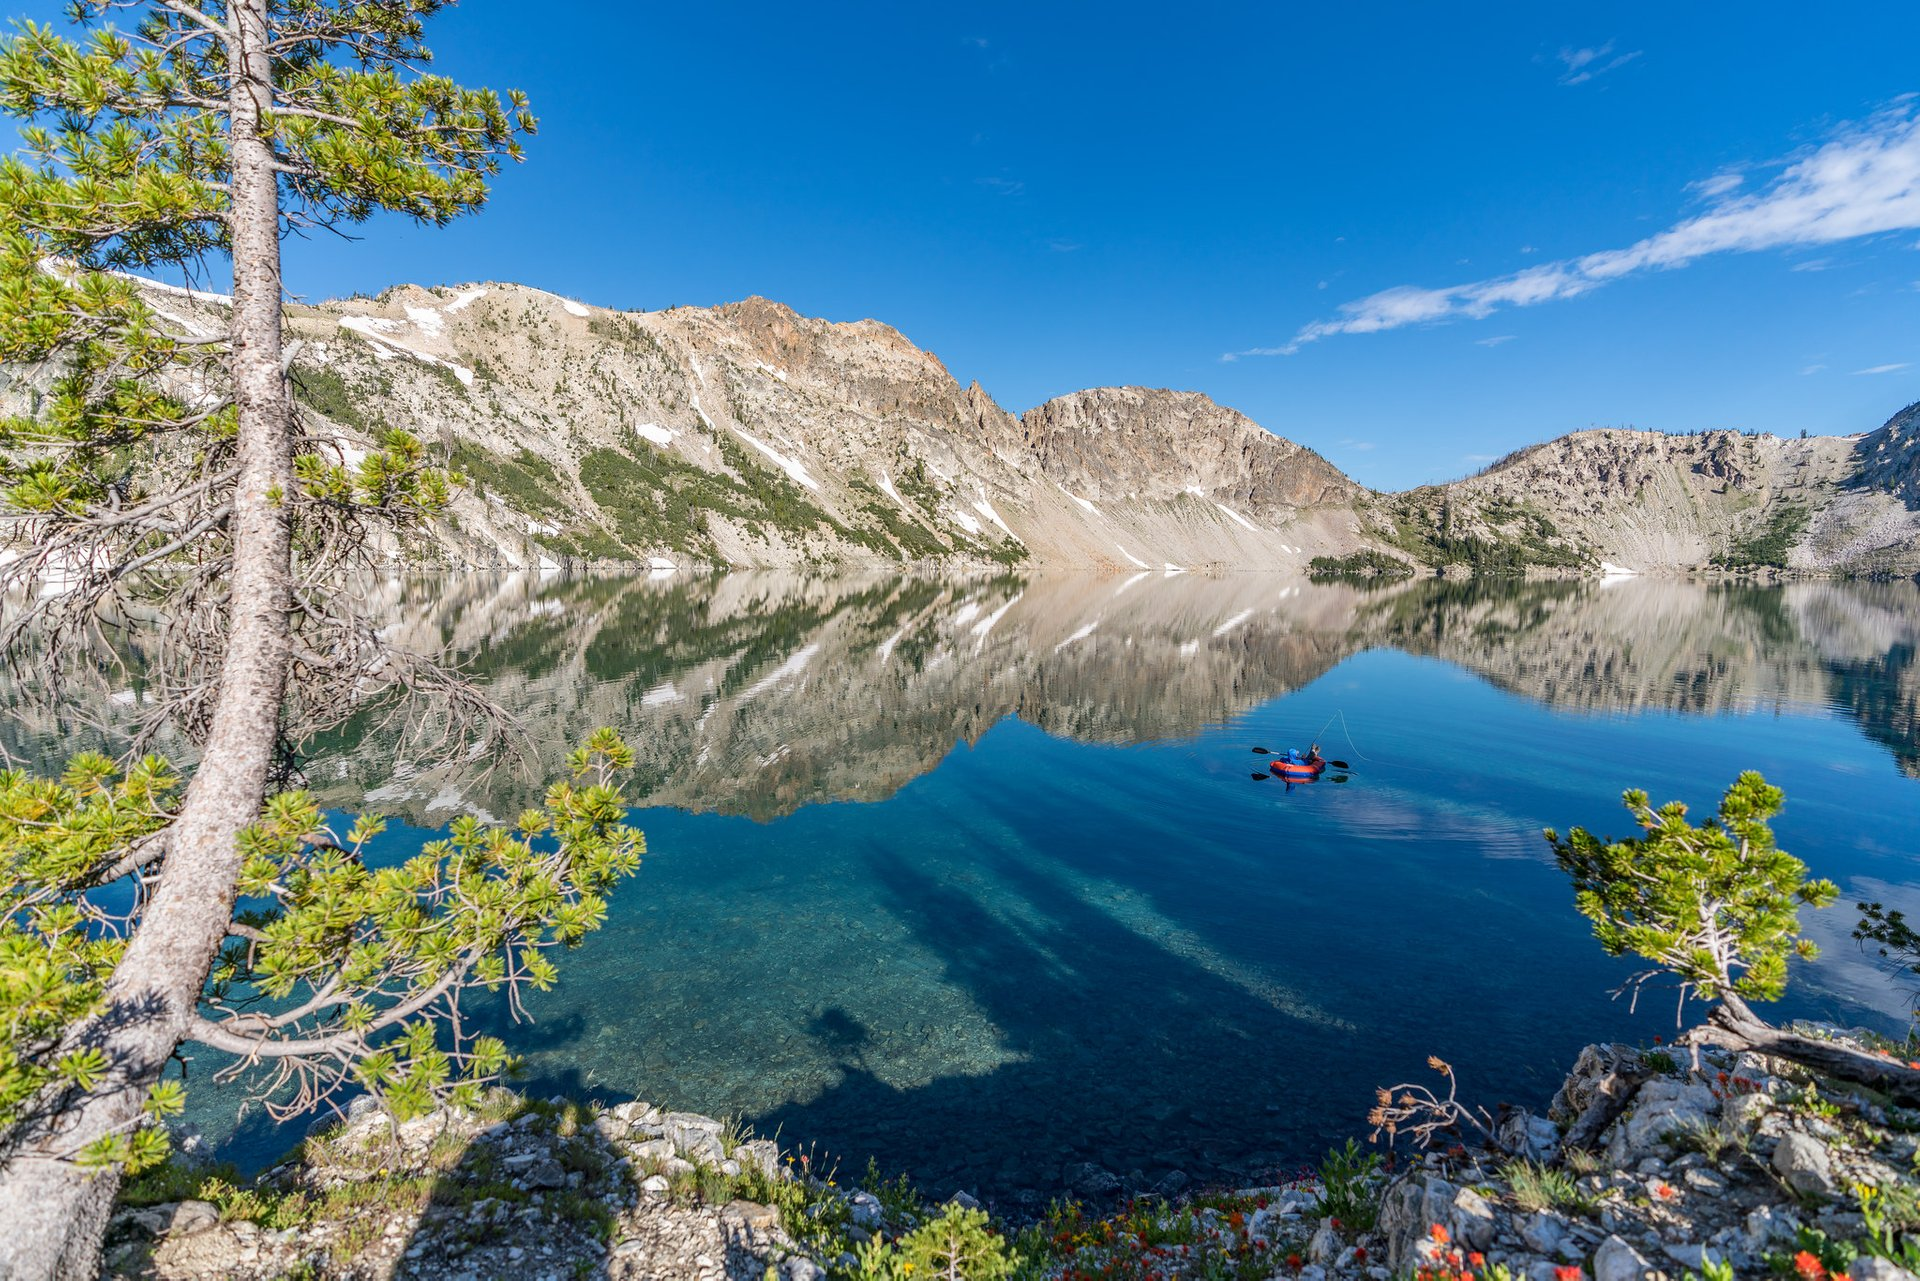 Rafting and fishing on Sawtooth Lake 2020